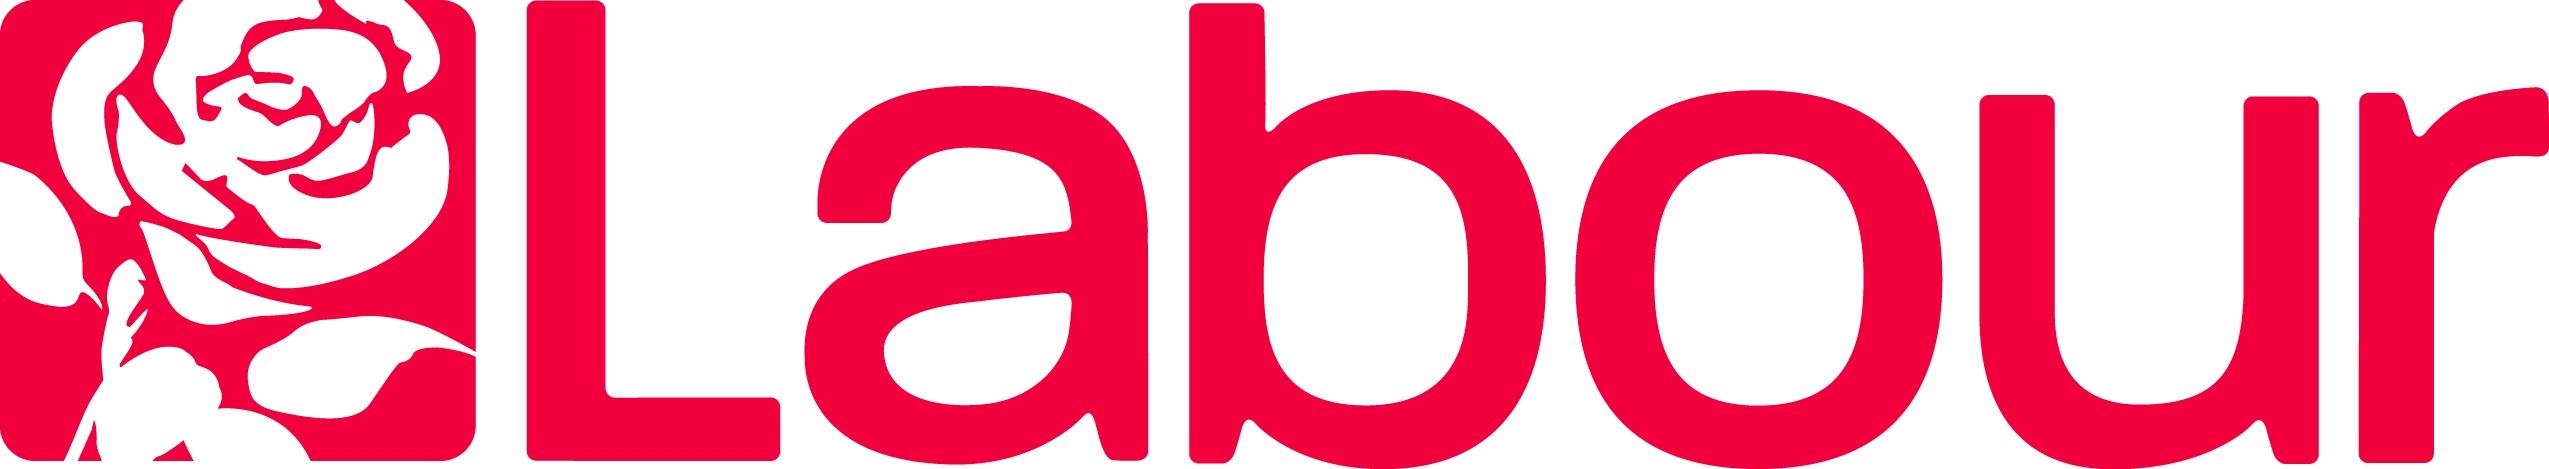 Hi_Res_Labour_Logo.jpg